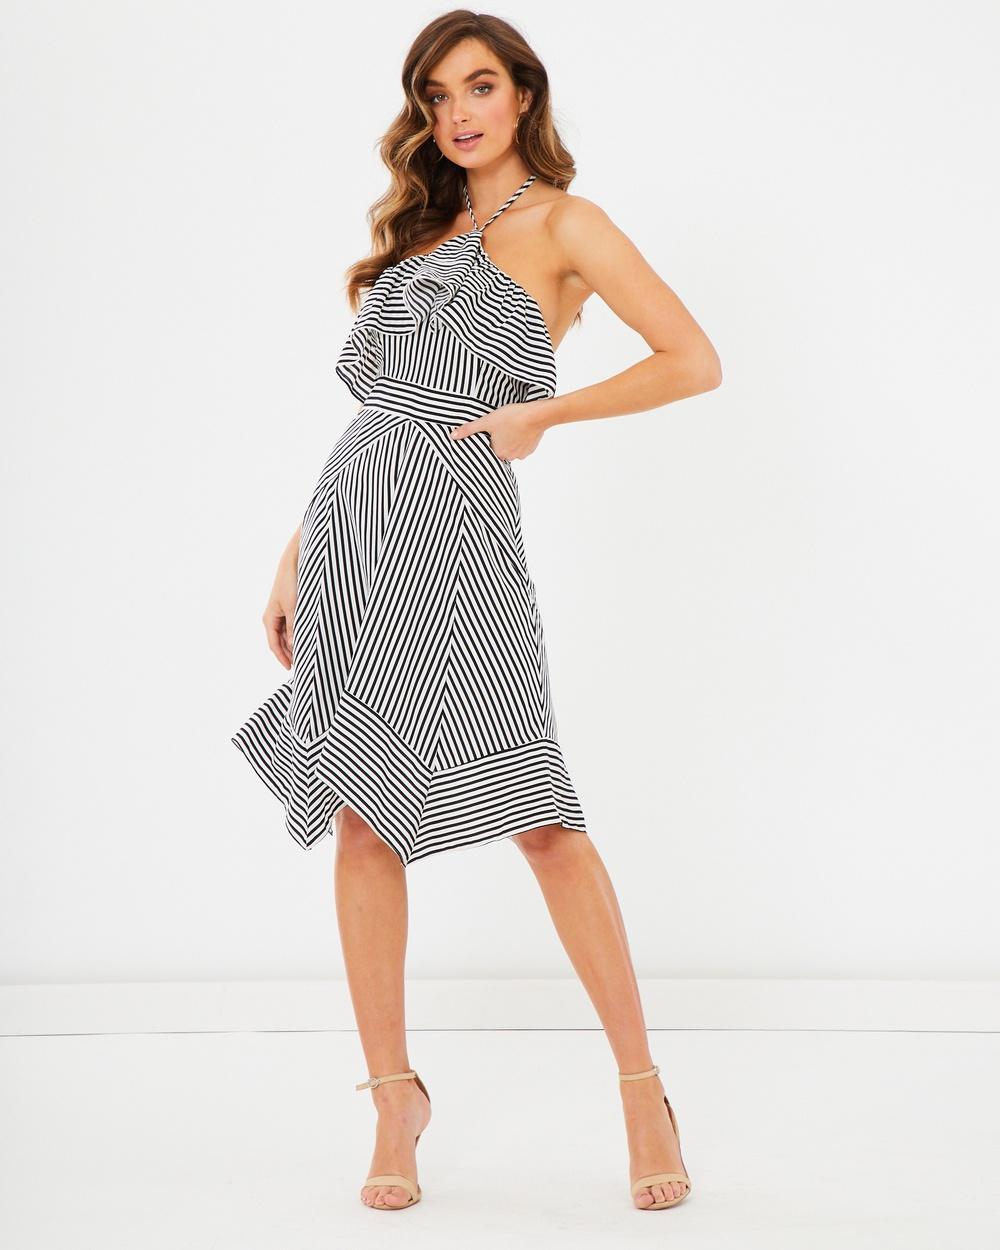 Photo of Tussah Black Stripe Henderson Halter Dress - beautiful dress from Tussah online